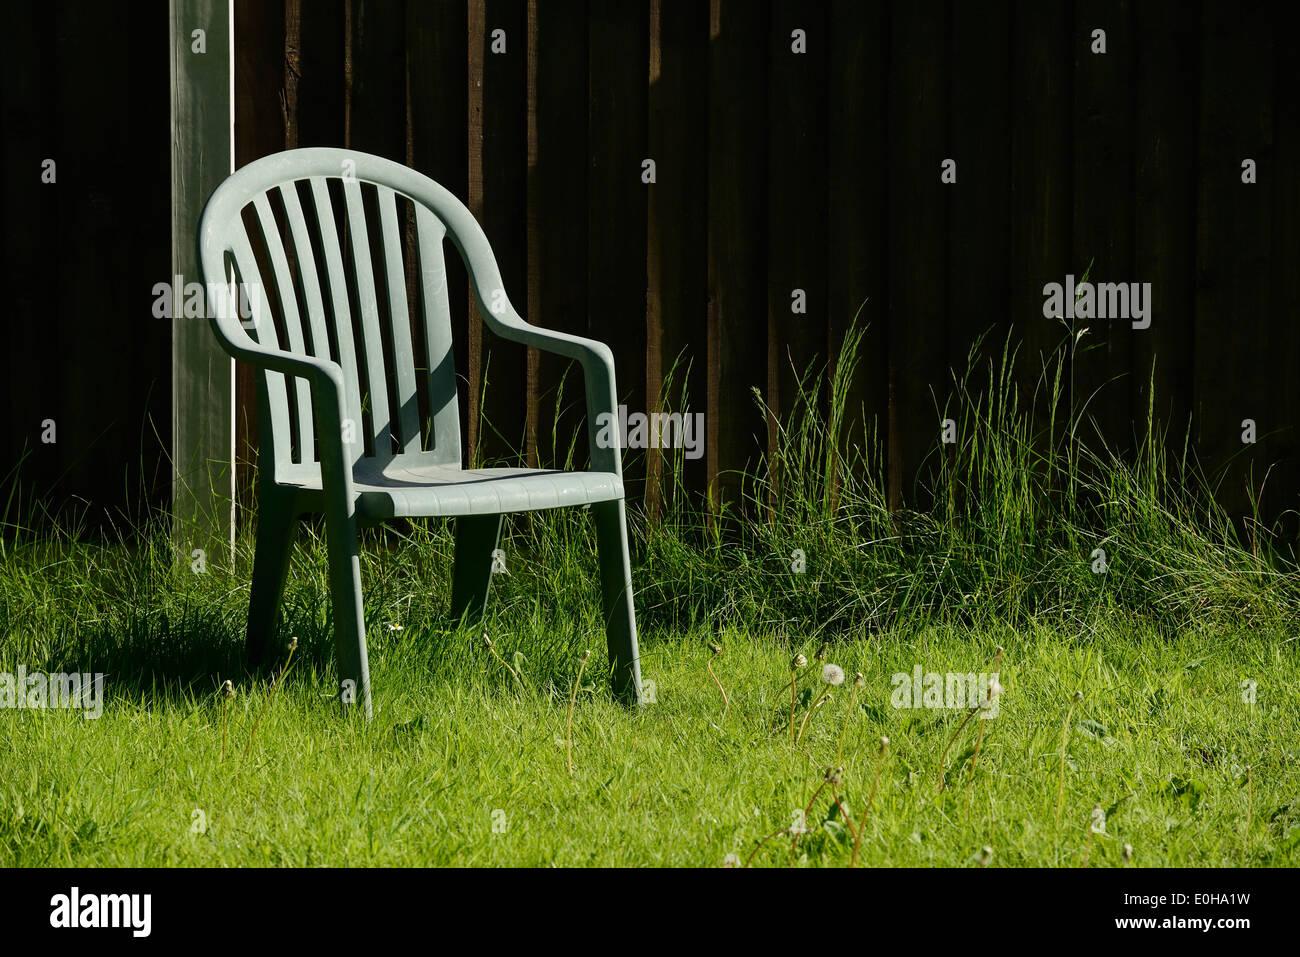 Sedie Da Giardino In Plastica Verdi.Sedie Da Giardino In Plastica Verdi Sedie In Plastica Per Esterno